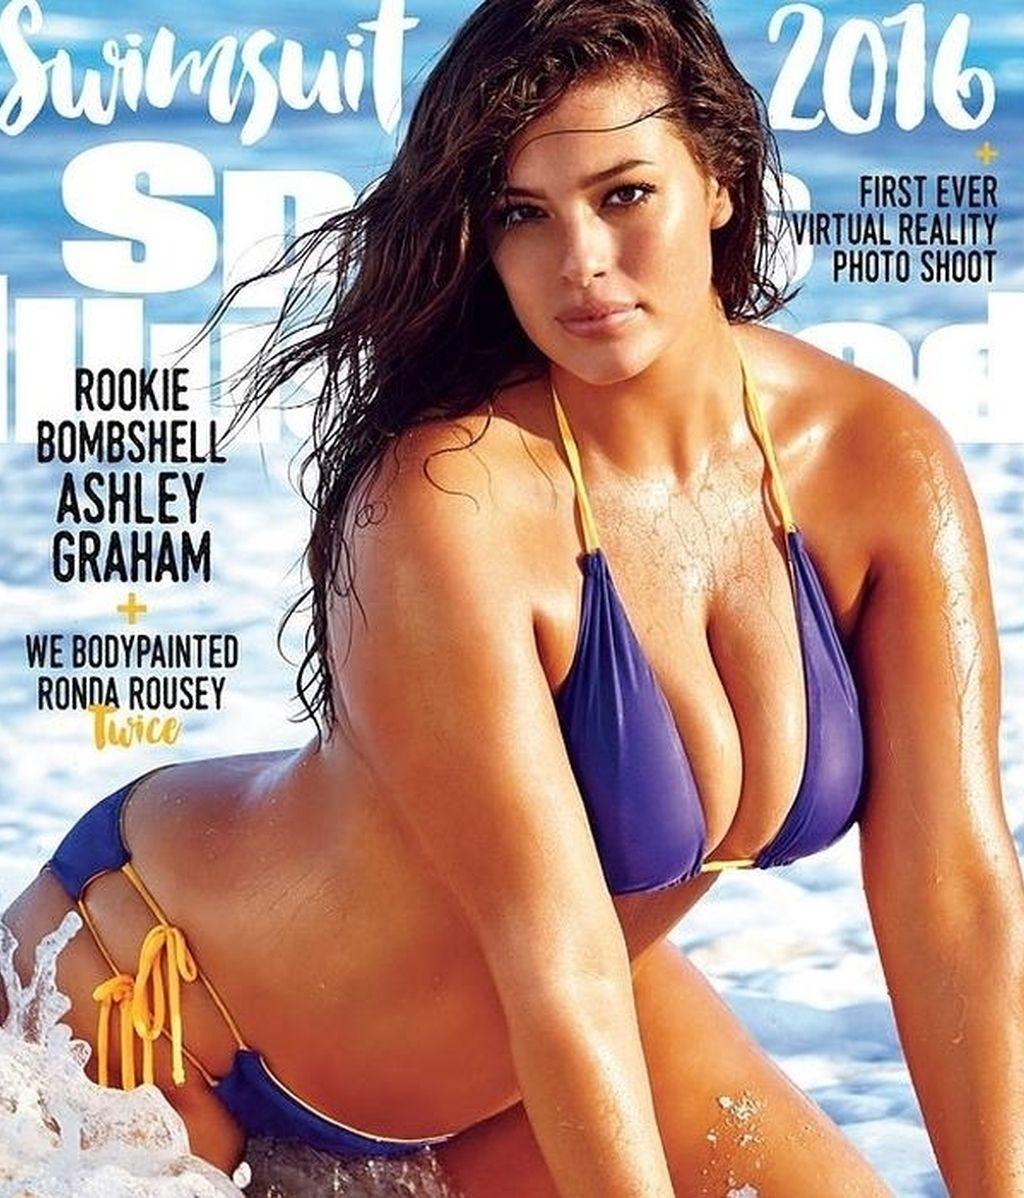 Ashley Graham protagoniza la portada de Sports Illustrated